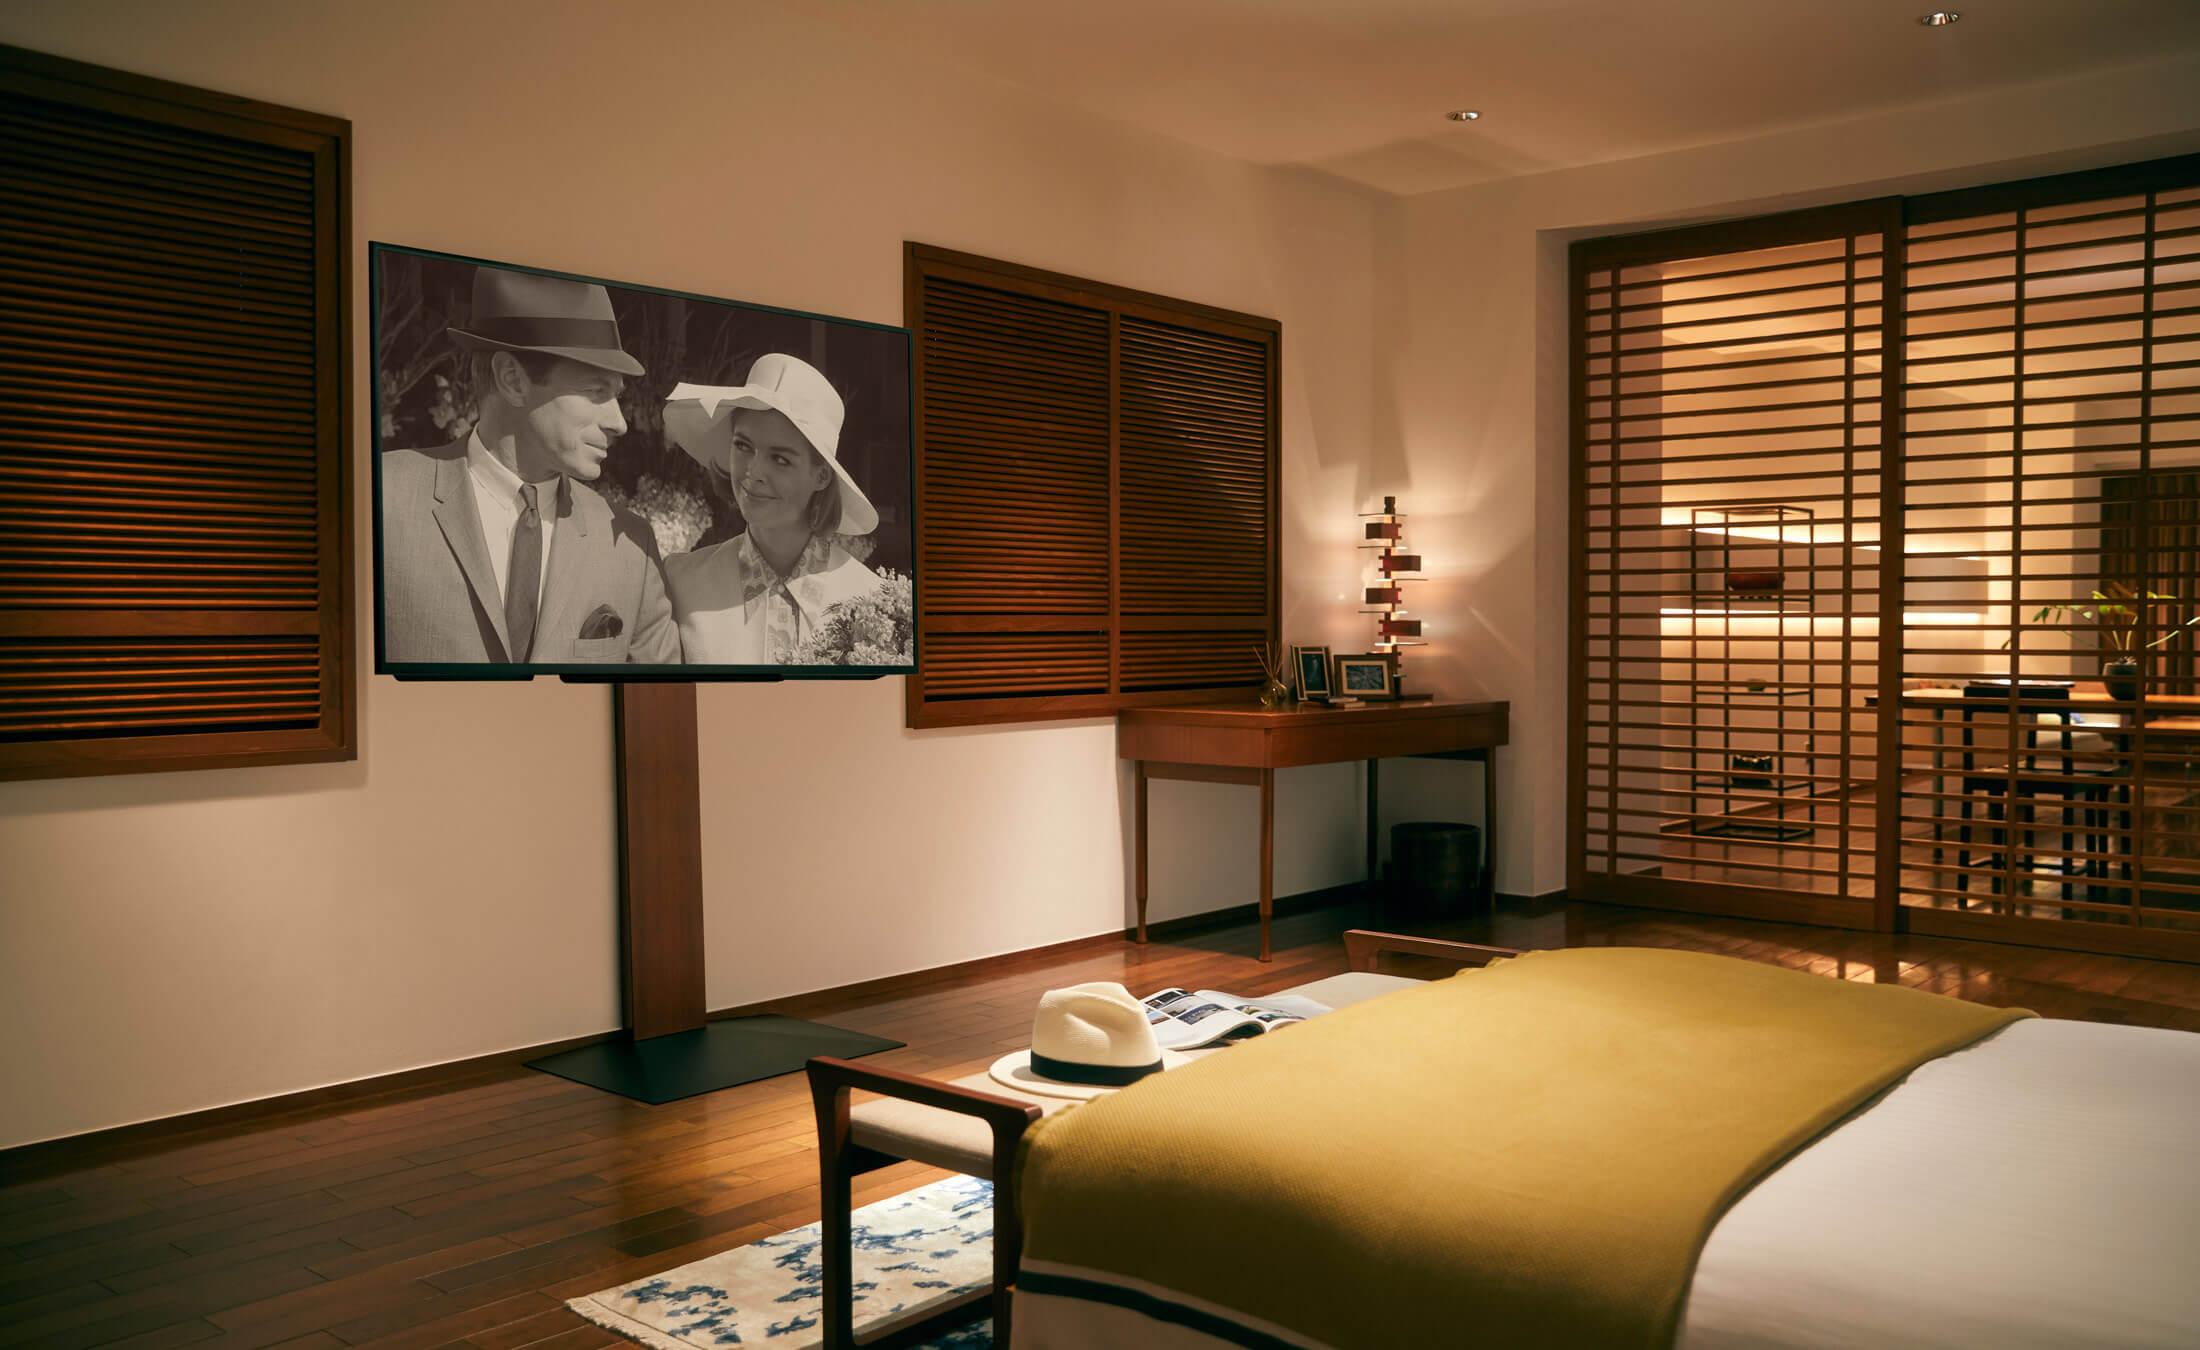 WALL INTERIOR TV STAND V3 壁寄せテレビスタンドV3 BEDROOM 4枚目